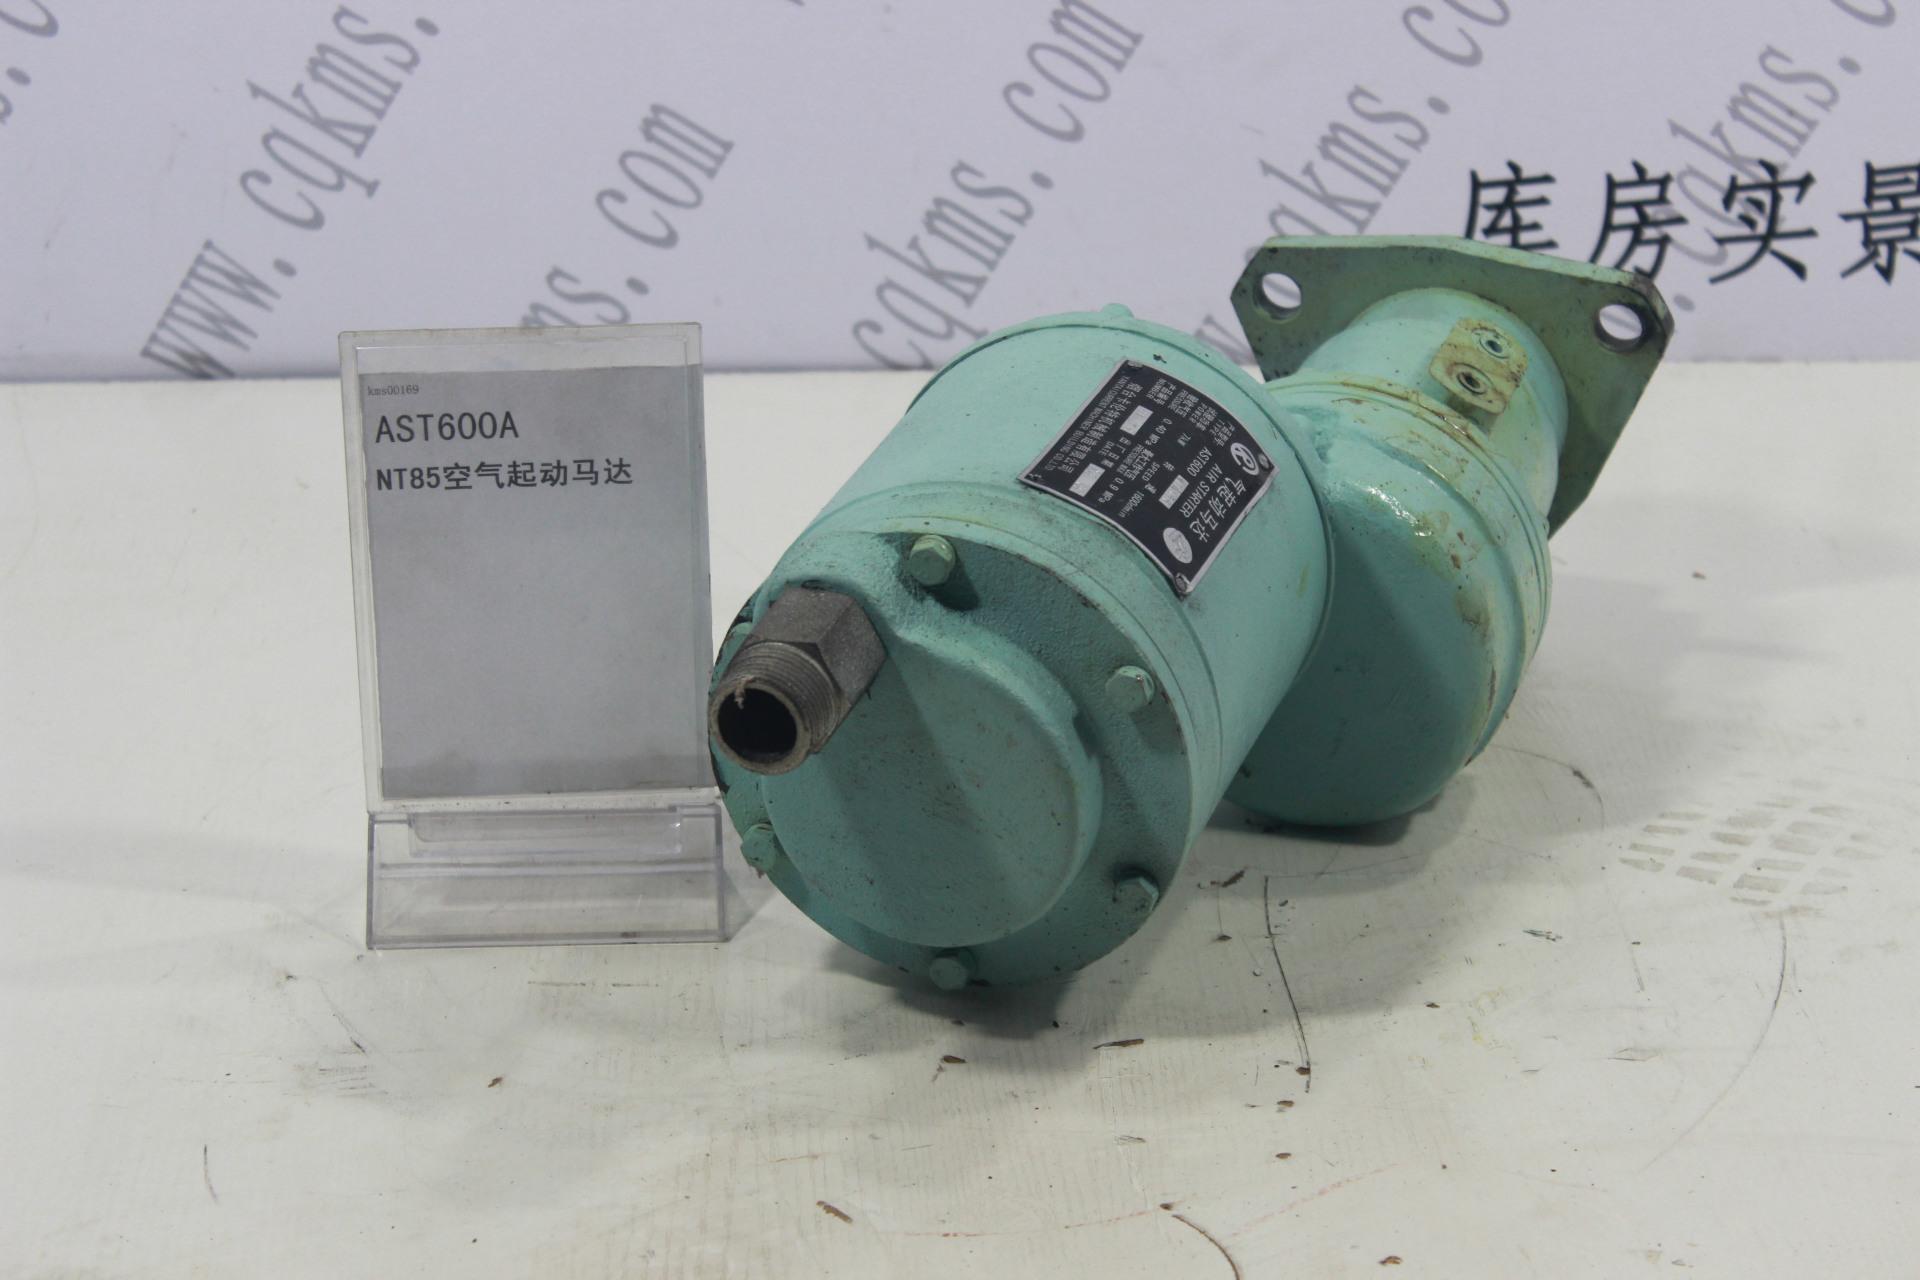 kms00169-AST600A-NT85空气起动马达-用于NT855康明斯发动机-NT855-参考规格49*23*28CM含包装-参考重量40kg净重34.15kg-40kg净重34.15kg图片6